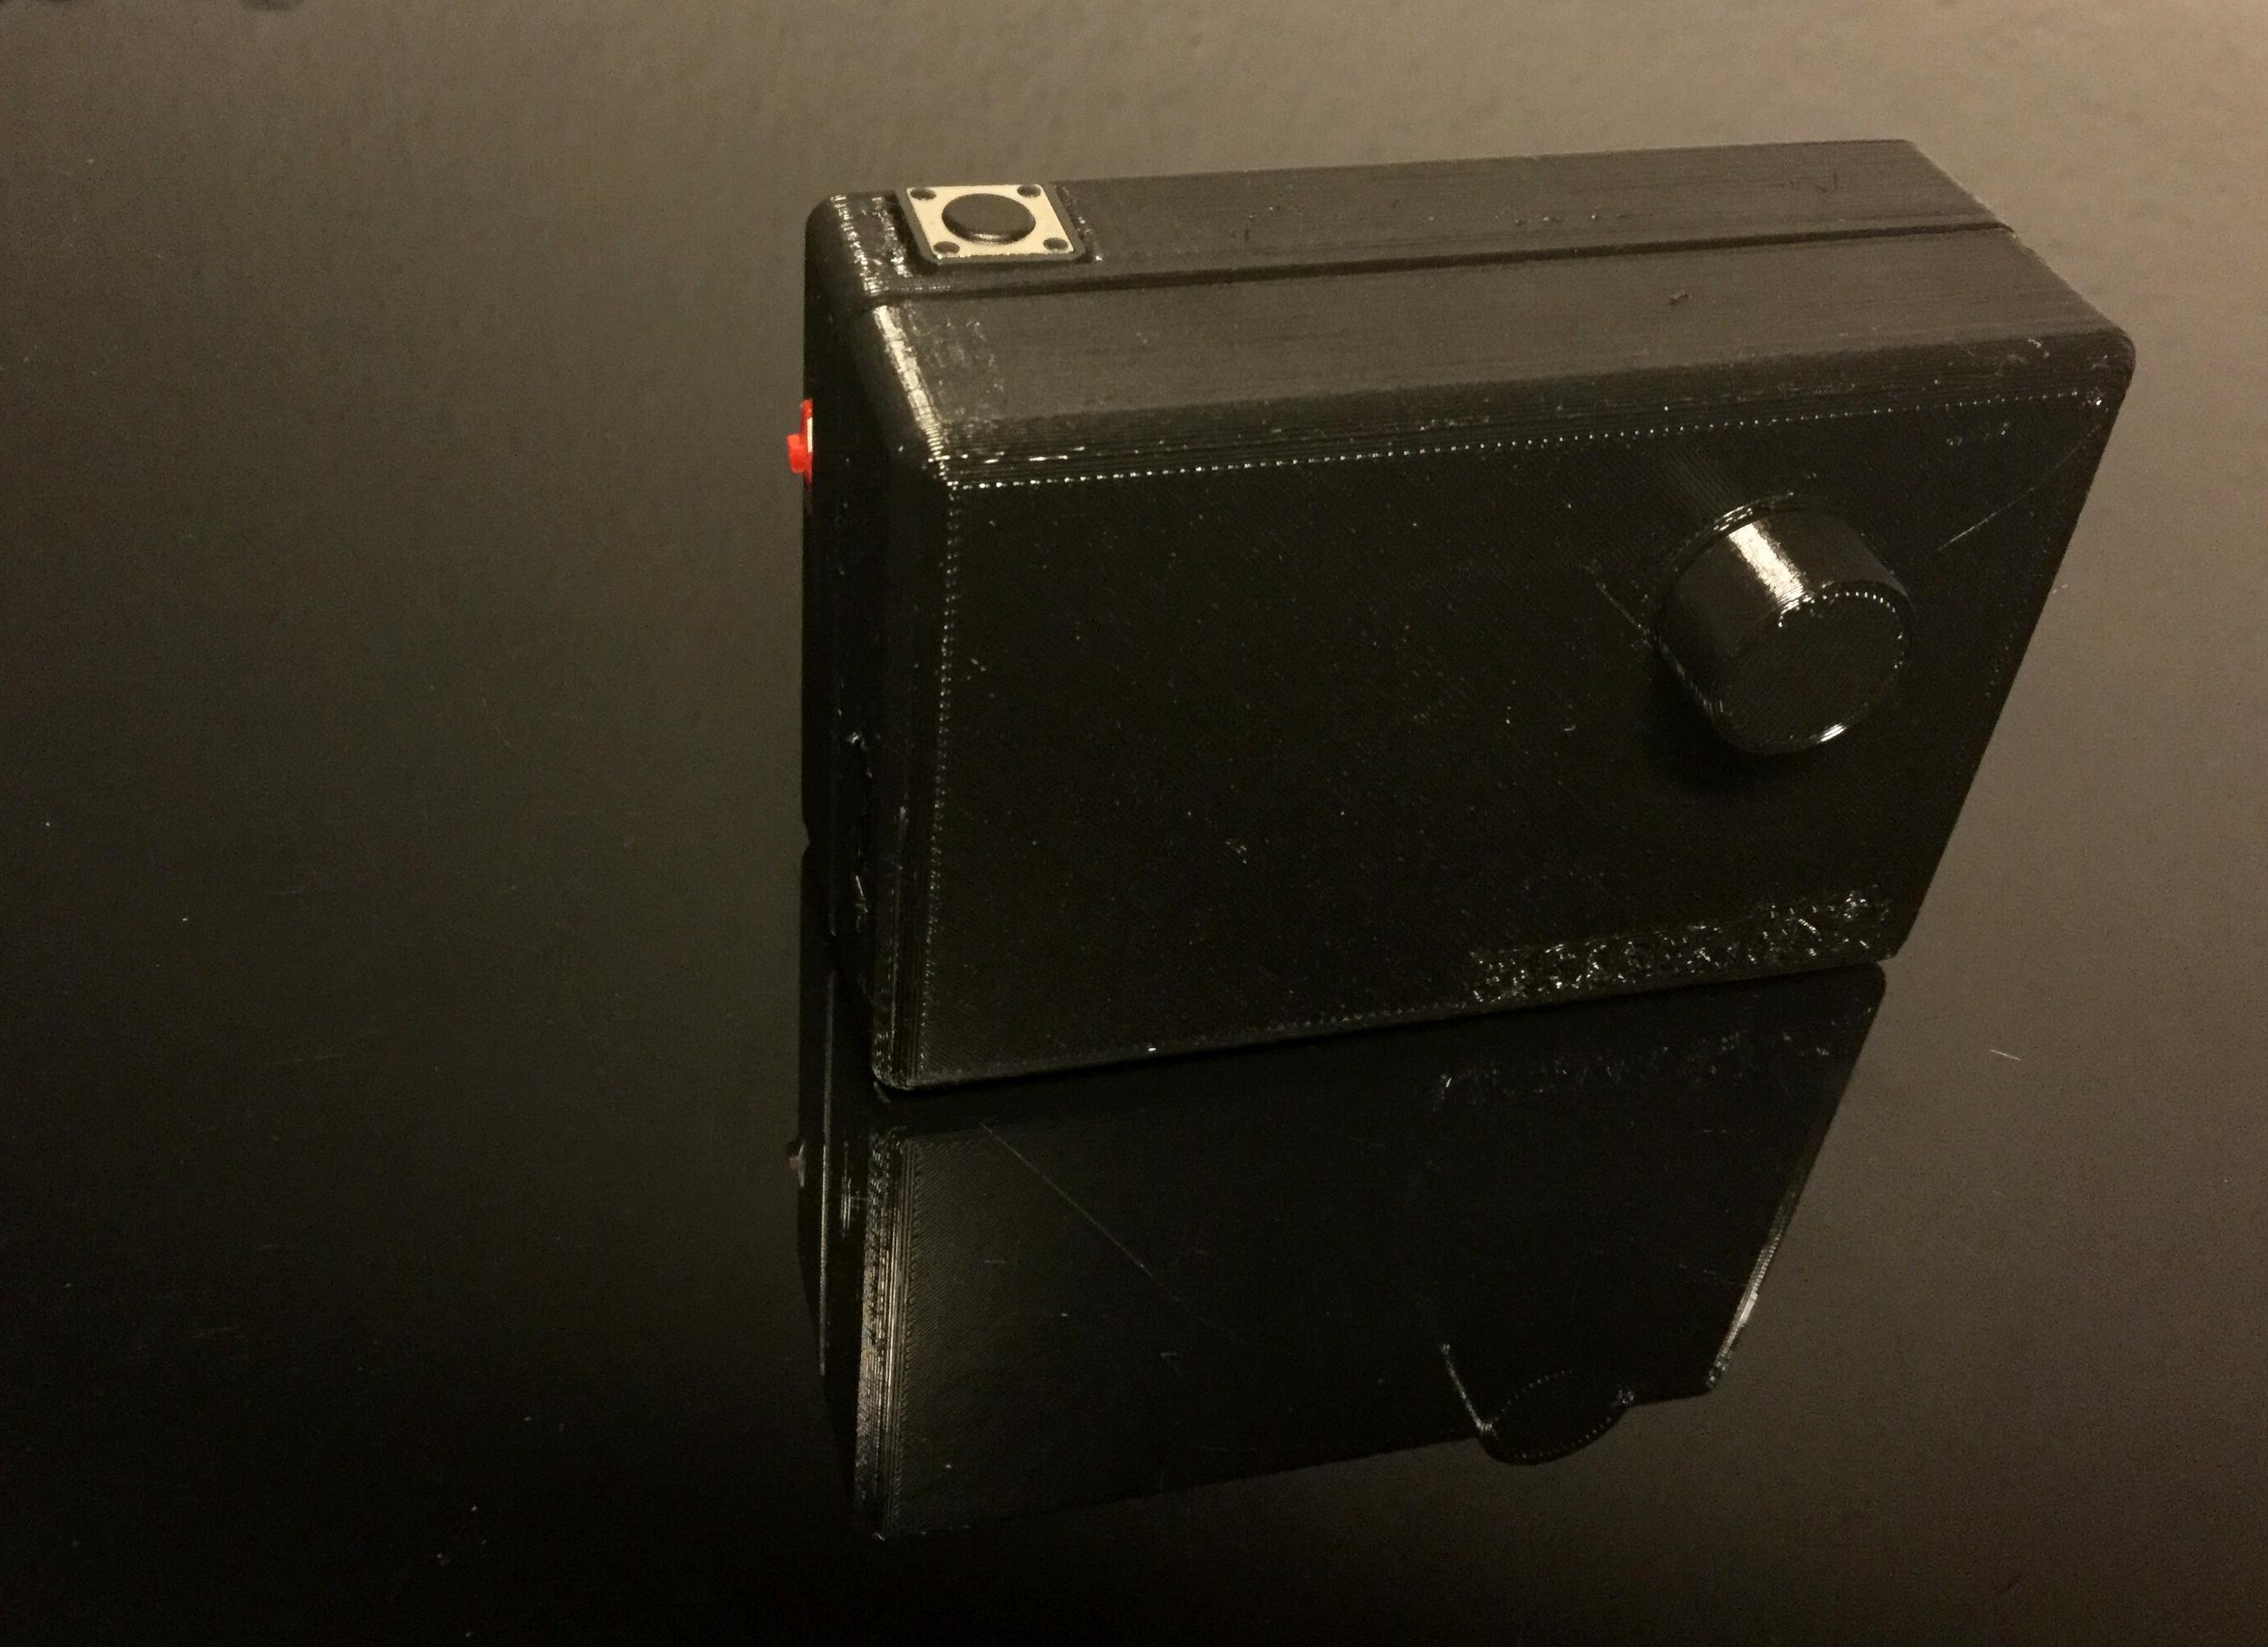 FS2 WiFi camera